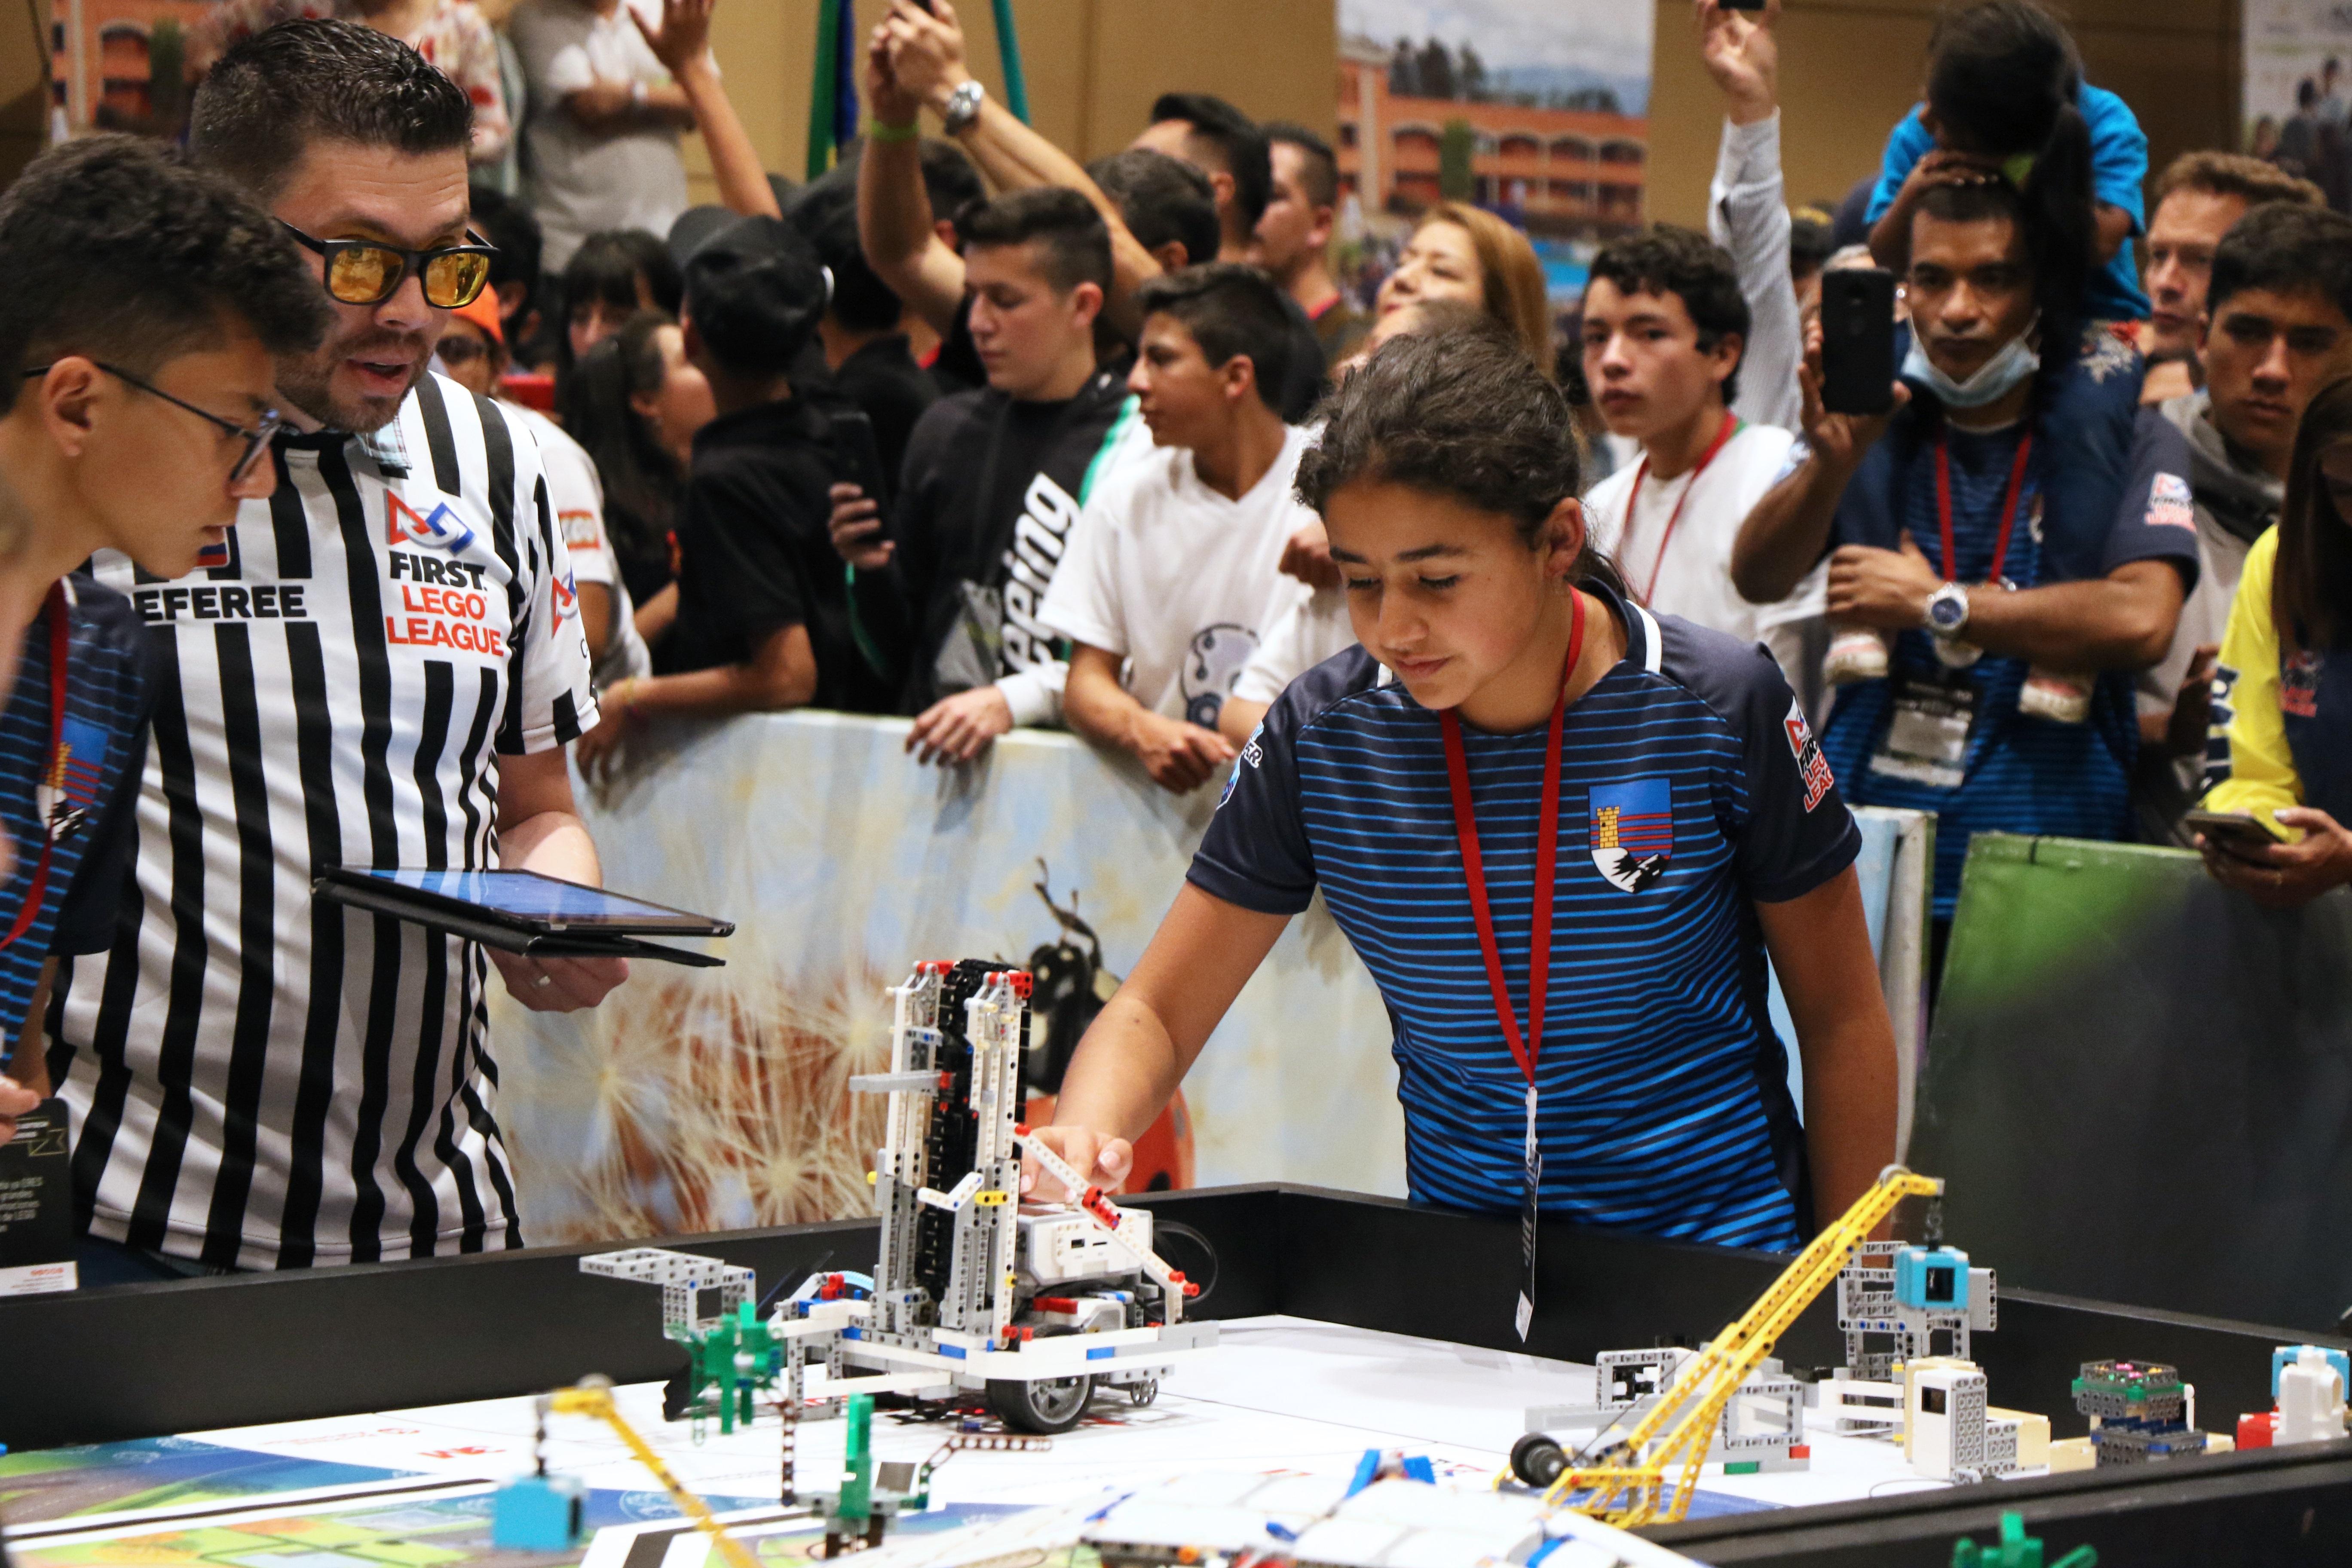 Llega la final de Competencia nacional FIRST LEGO League Colombia 2021